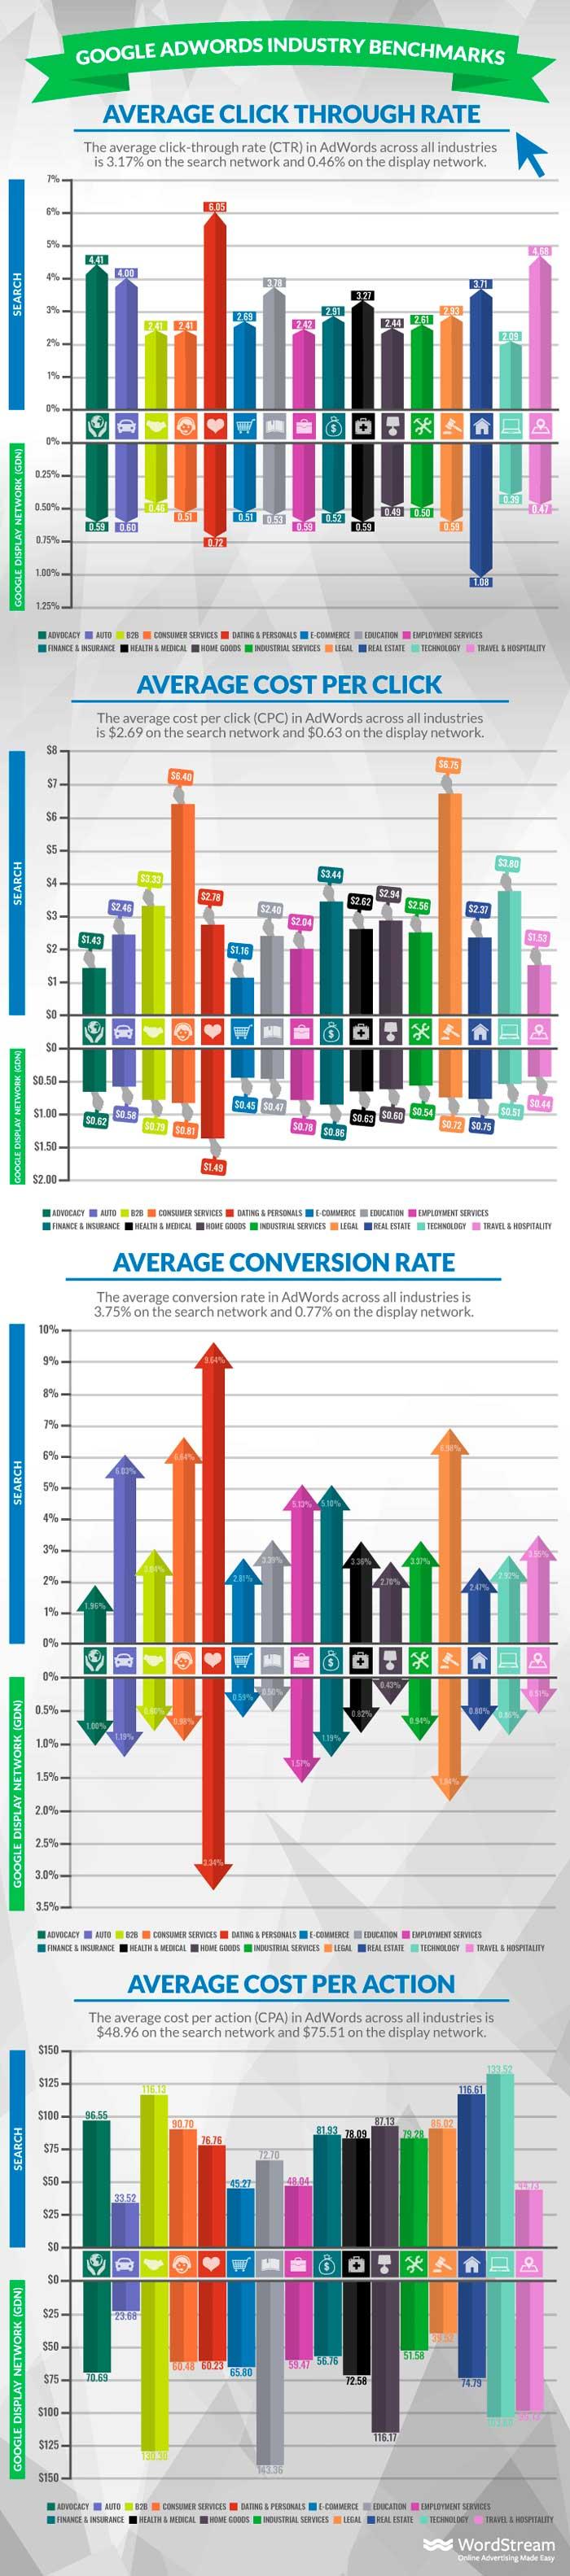 google adwords métricas promedio 2018